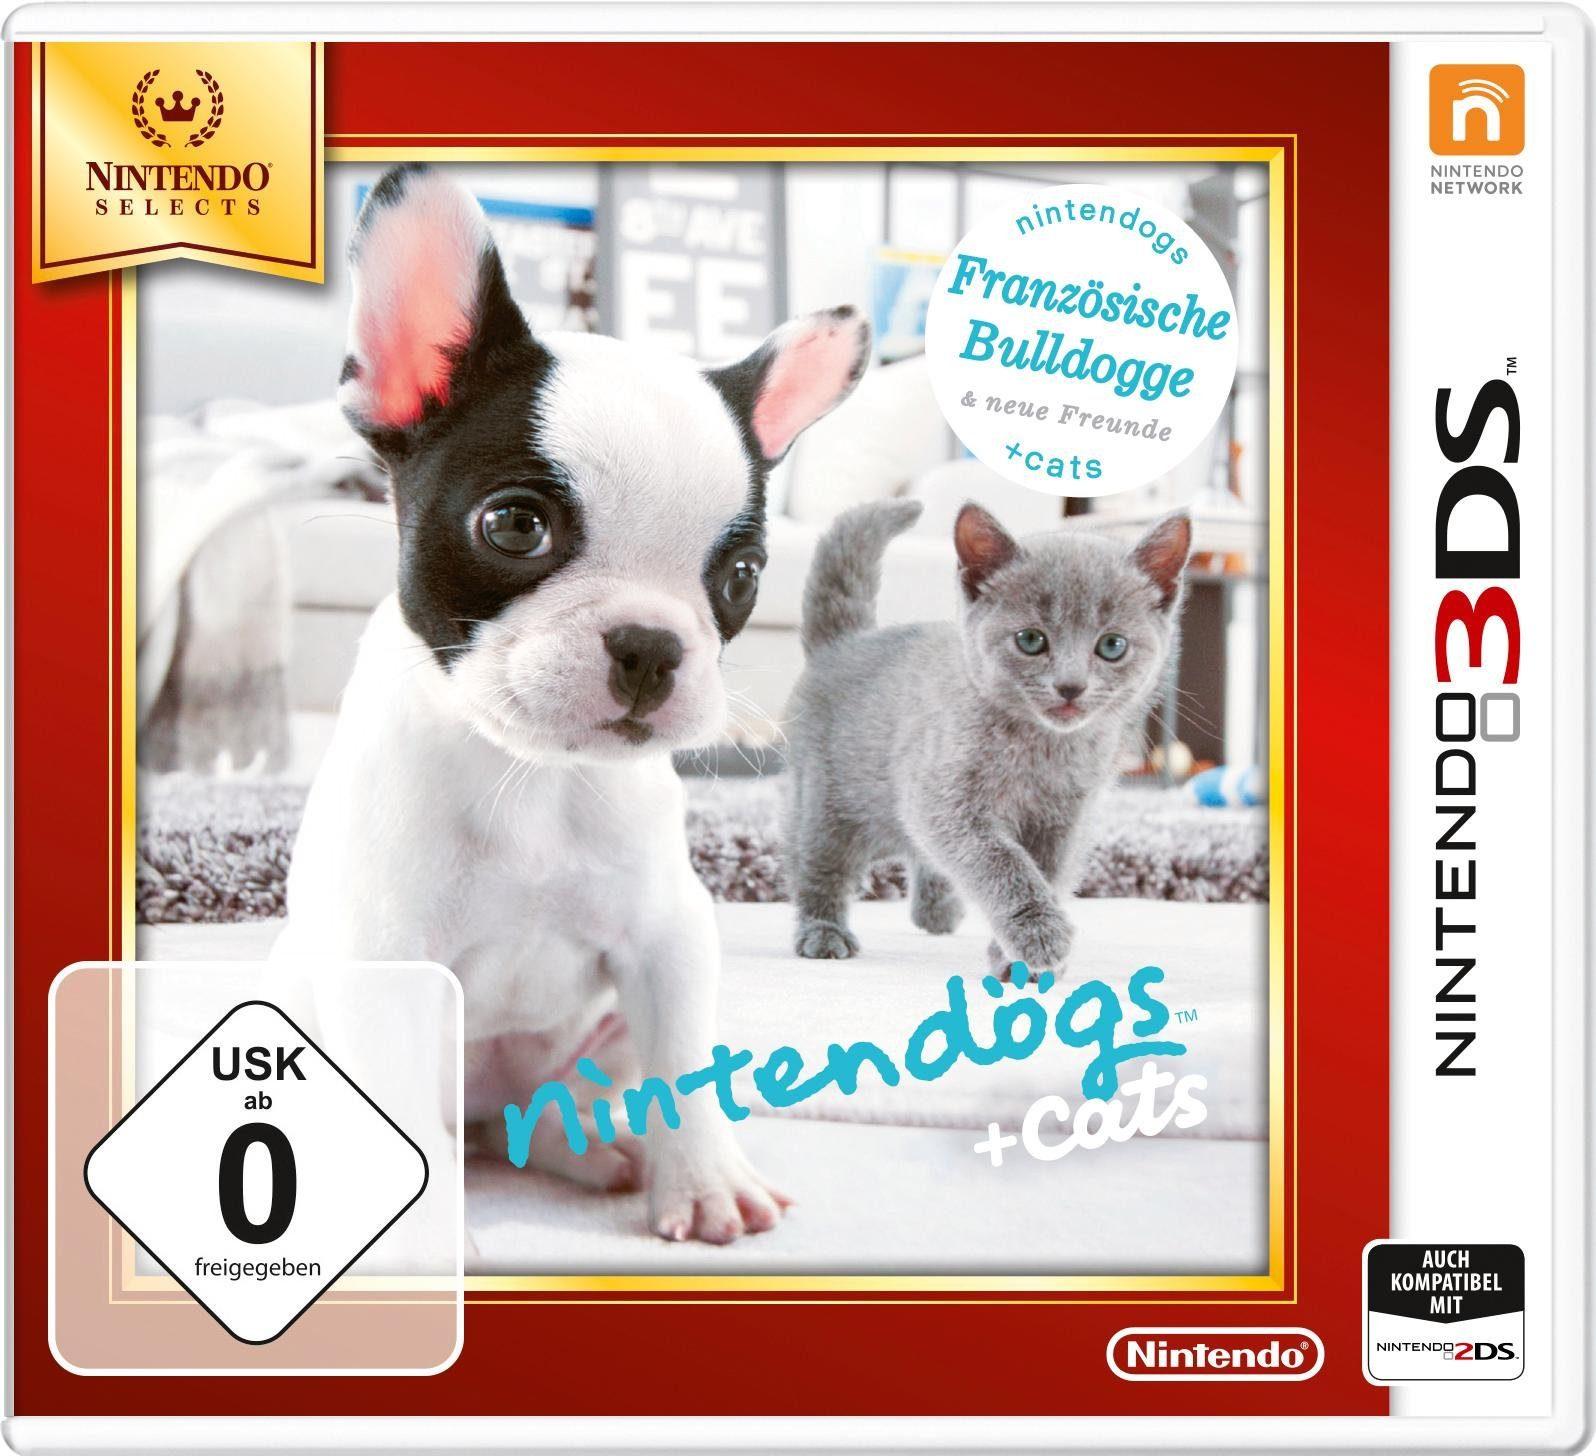 Nintendogs + Cats Französische Bulldogge & neue Freunde Nintendo Selects 3DS